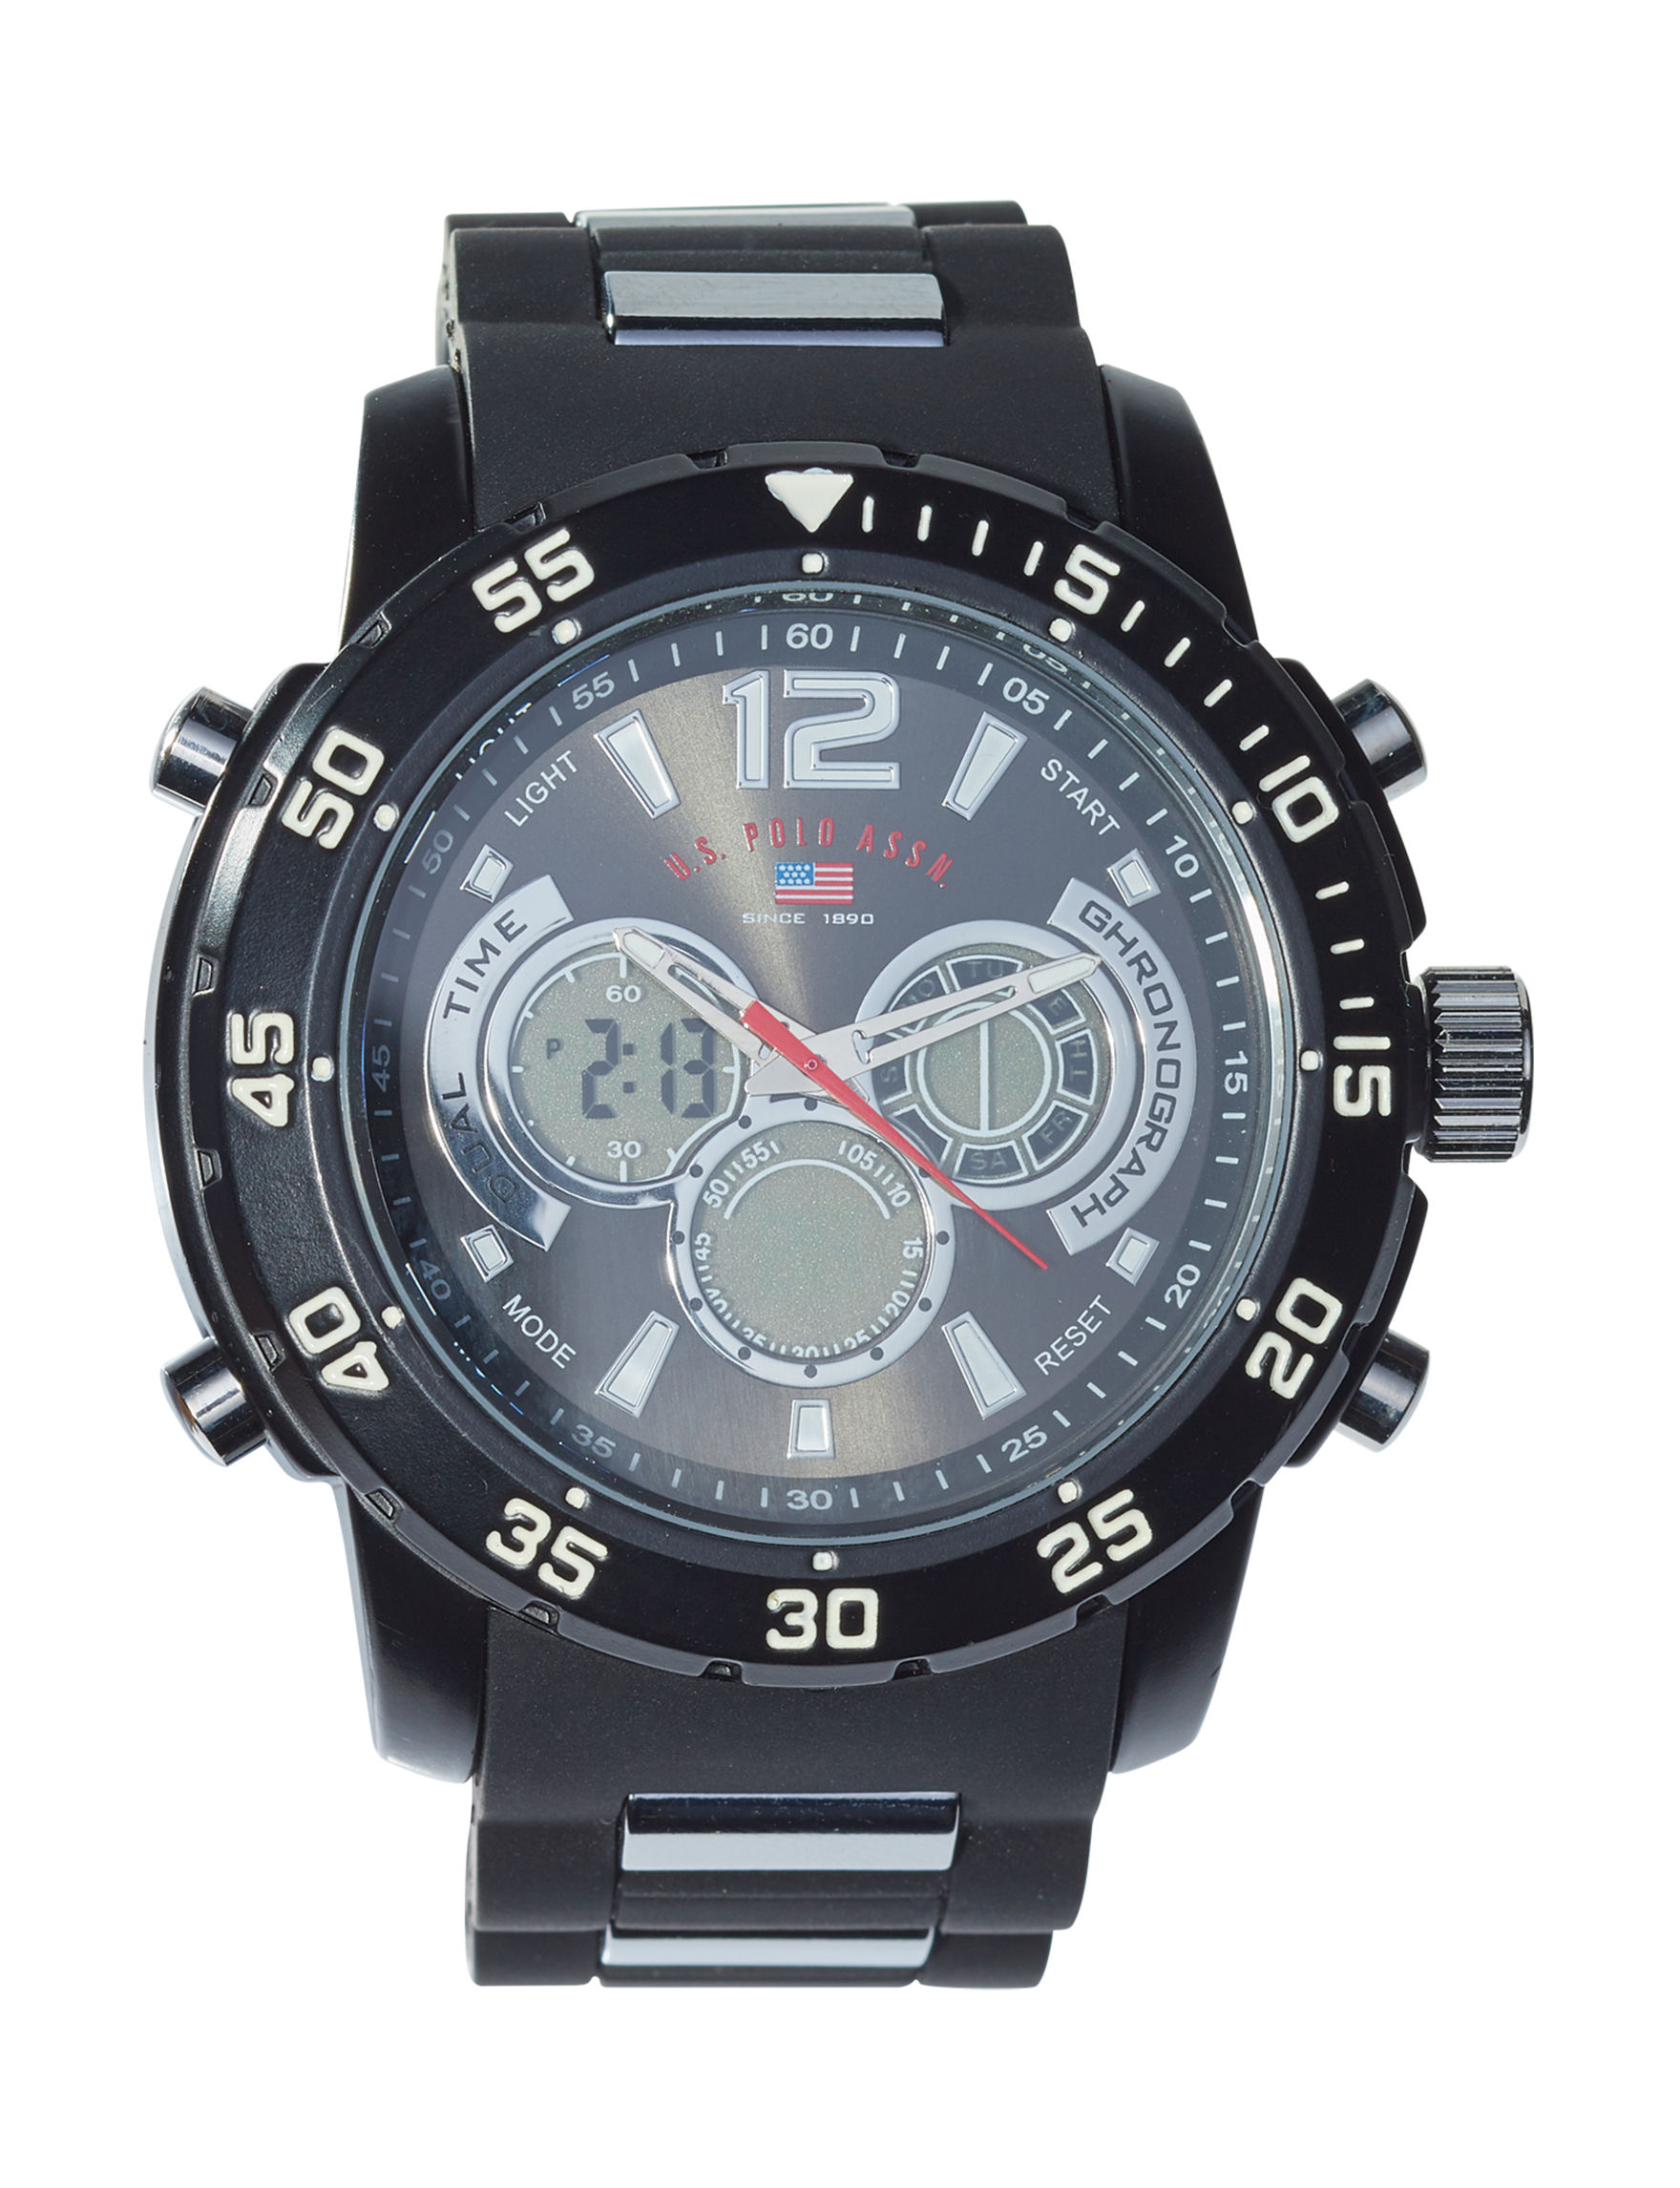 U.S. Polo Assn. Black Fashion Watches